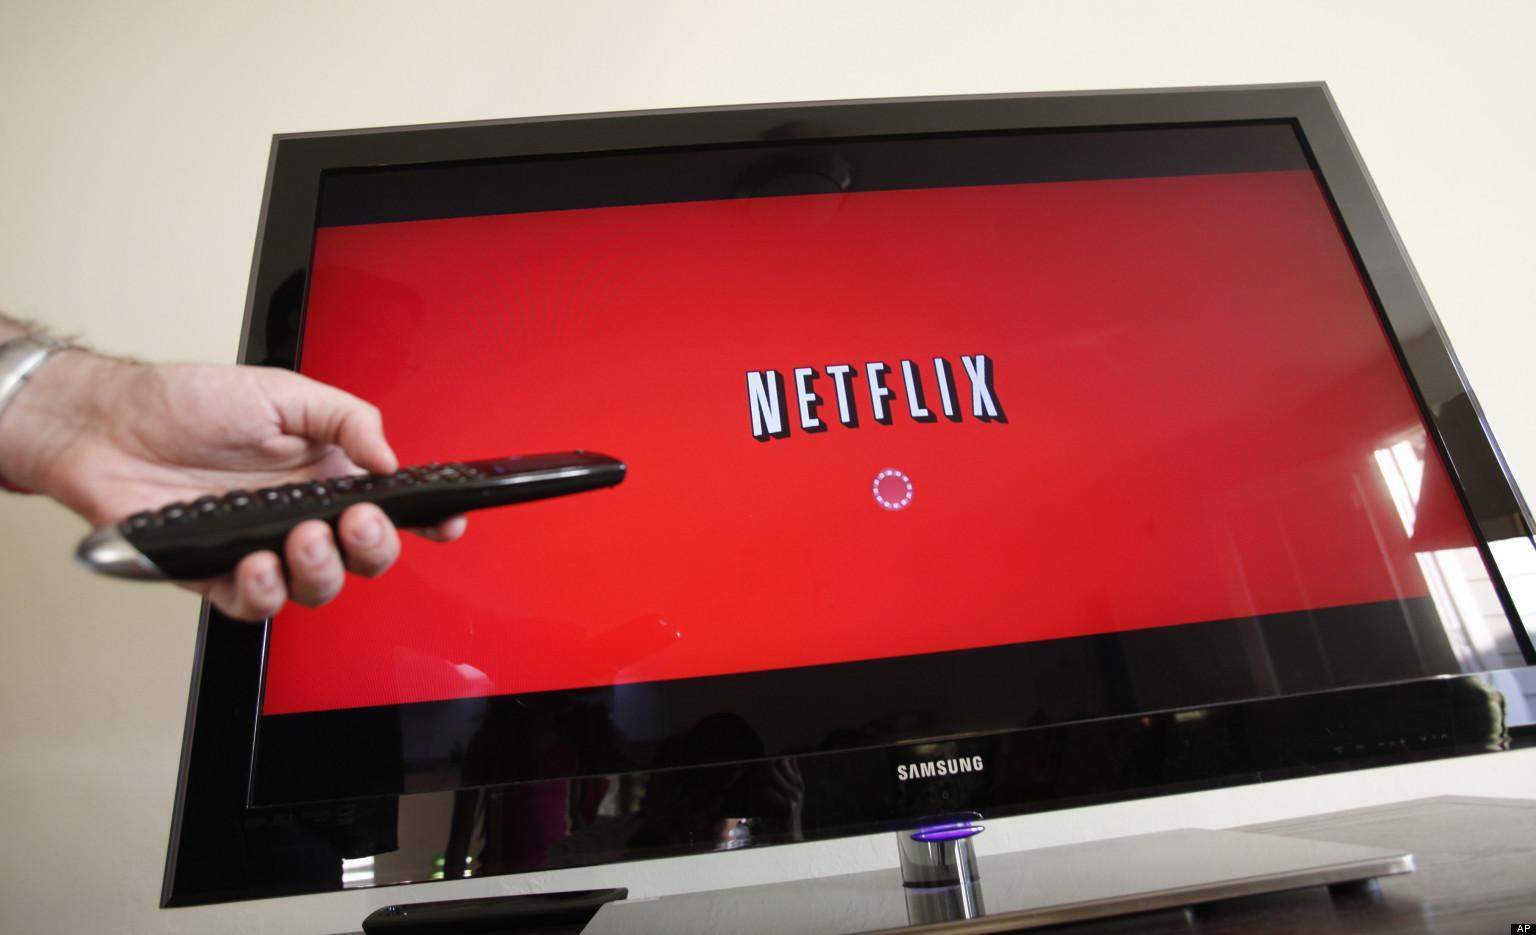 tv-loading-netflix.jpg